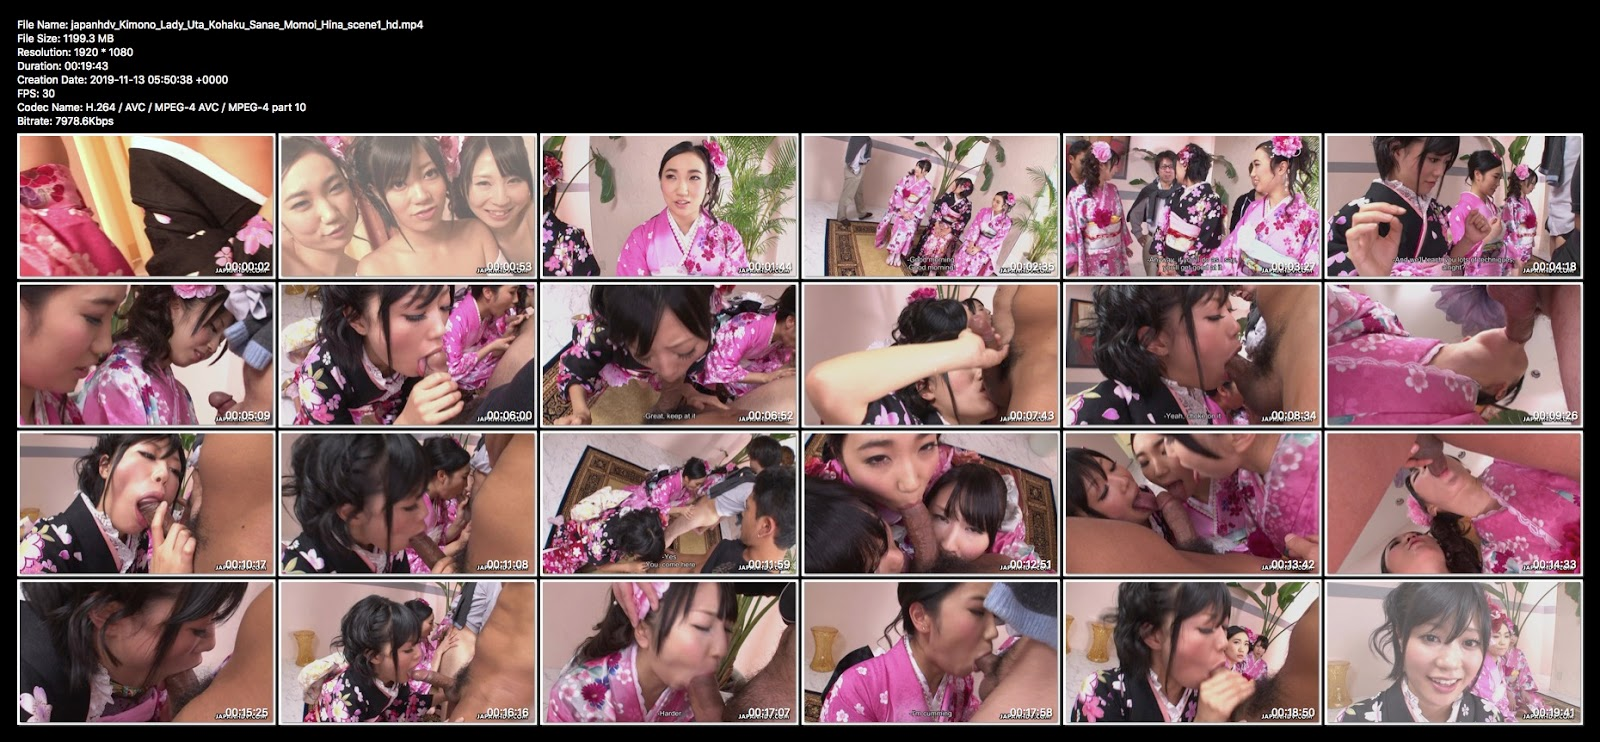 japanhdv_Kimono_Lady_Uta_Kohaku_Sanae_Momoi_Hina_scene1_hd japanhdv Kimono_Lady_Uta_Kohaku_Sanae_Momoi_Hina_scene1_hd